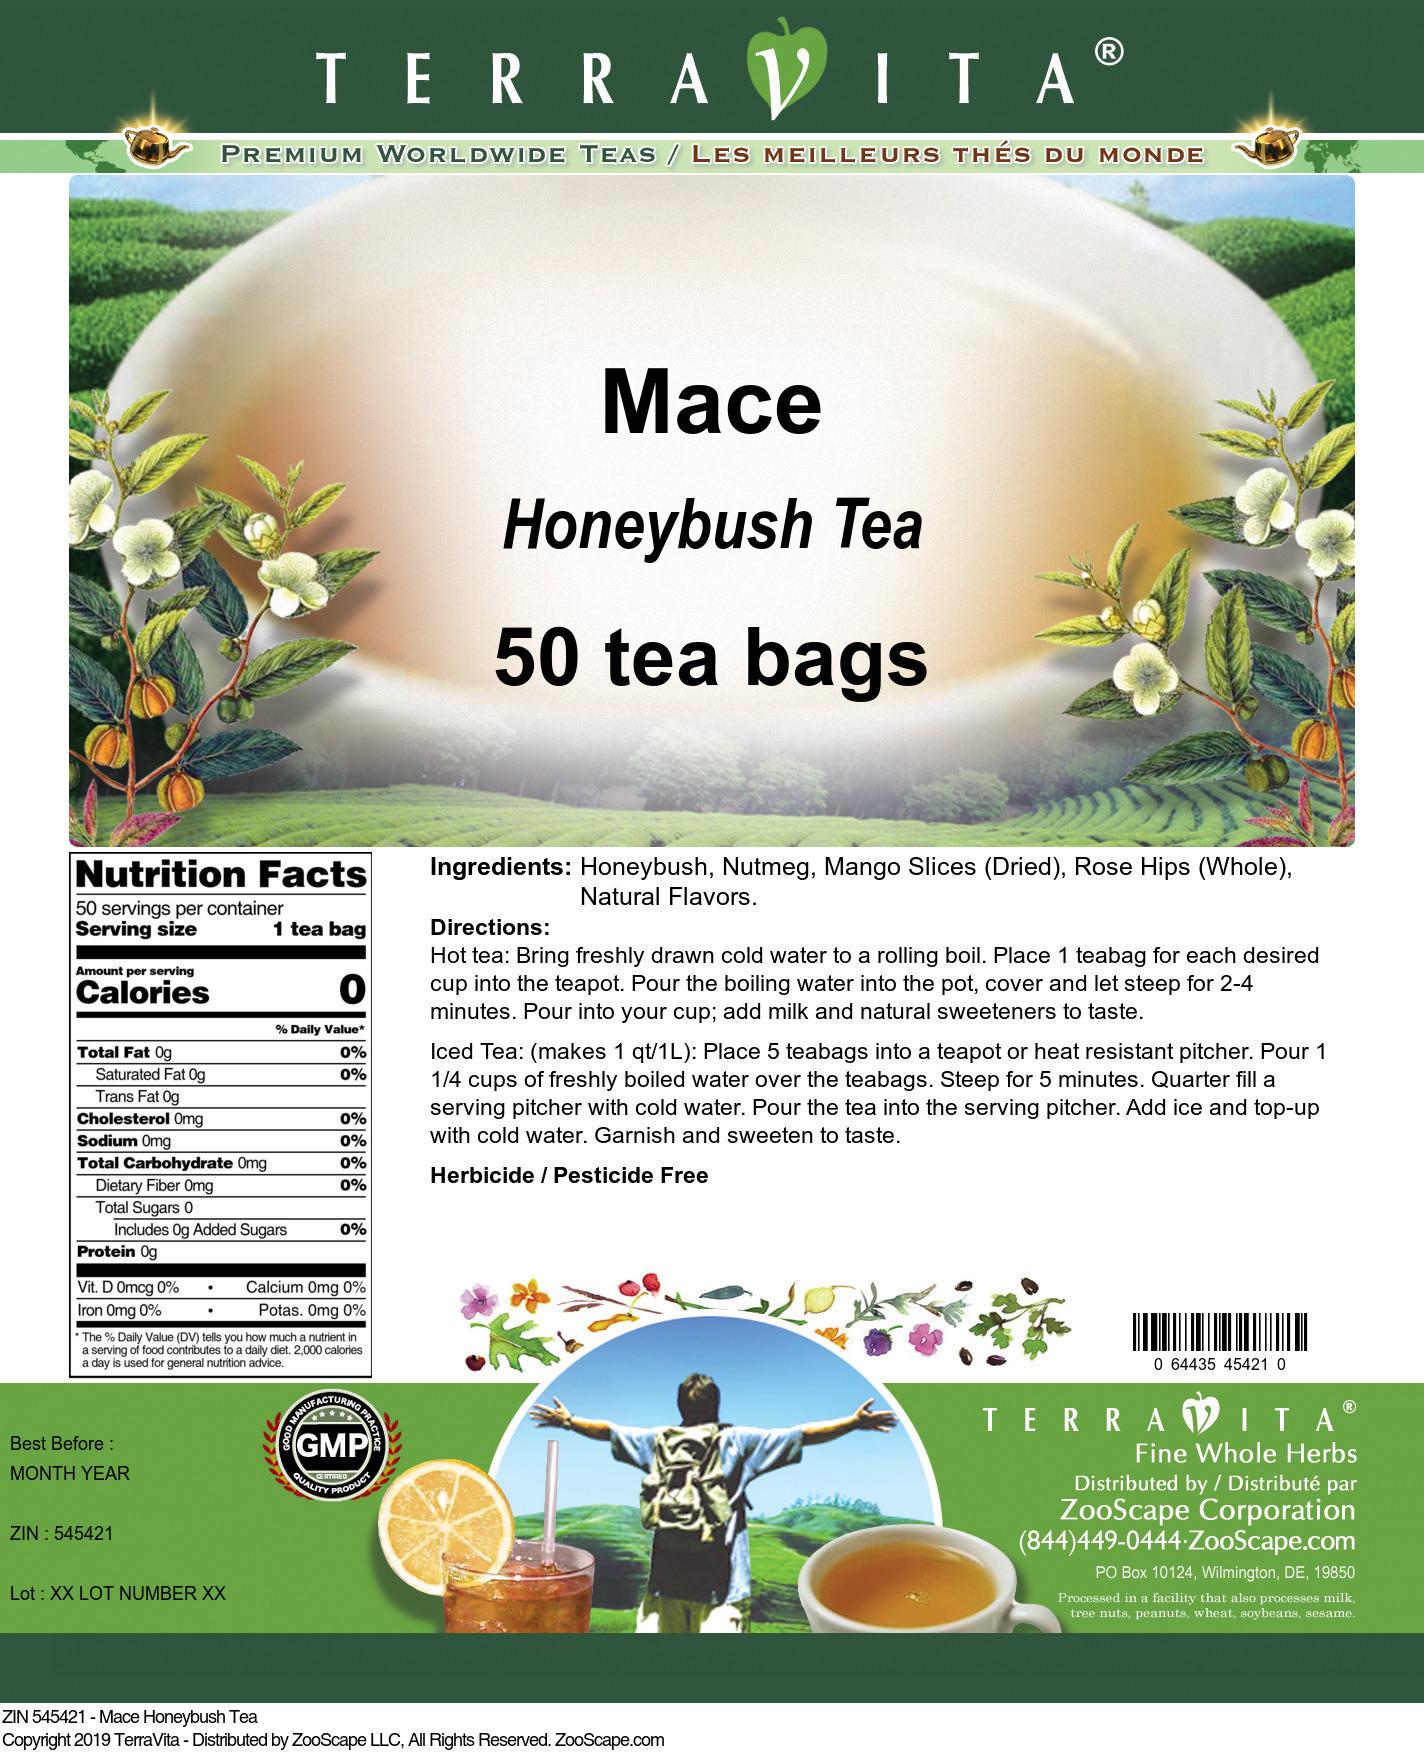 Mace Honeybush Tea